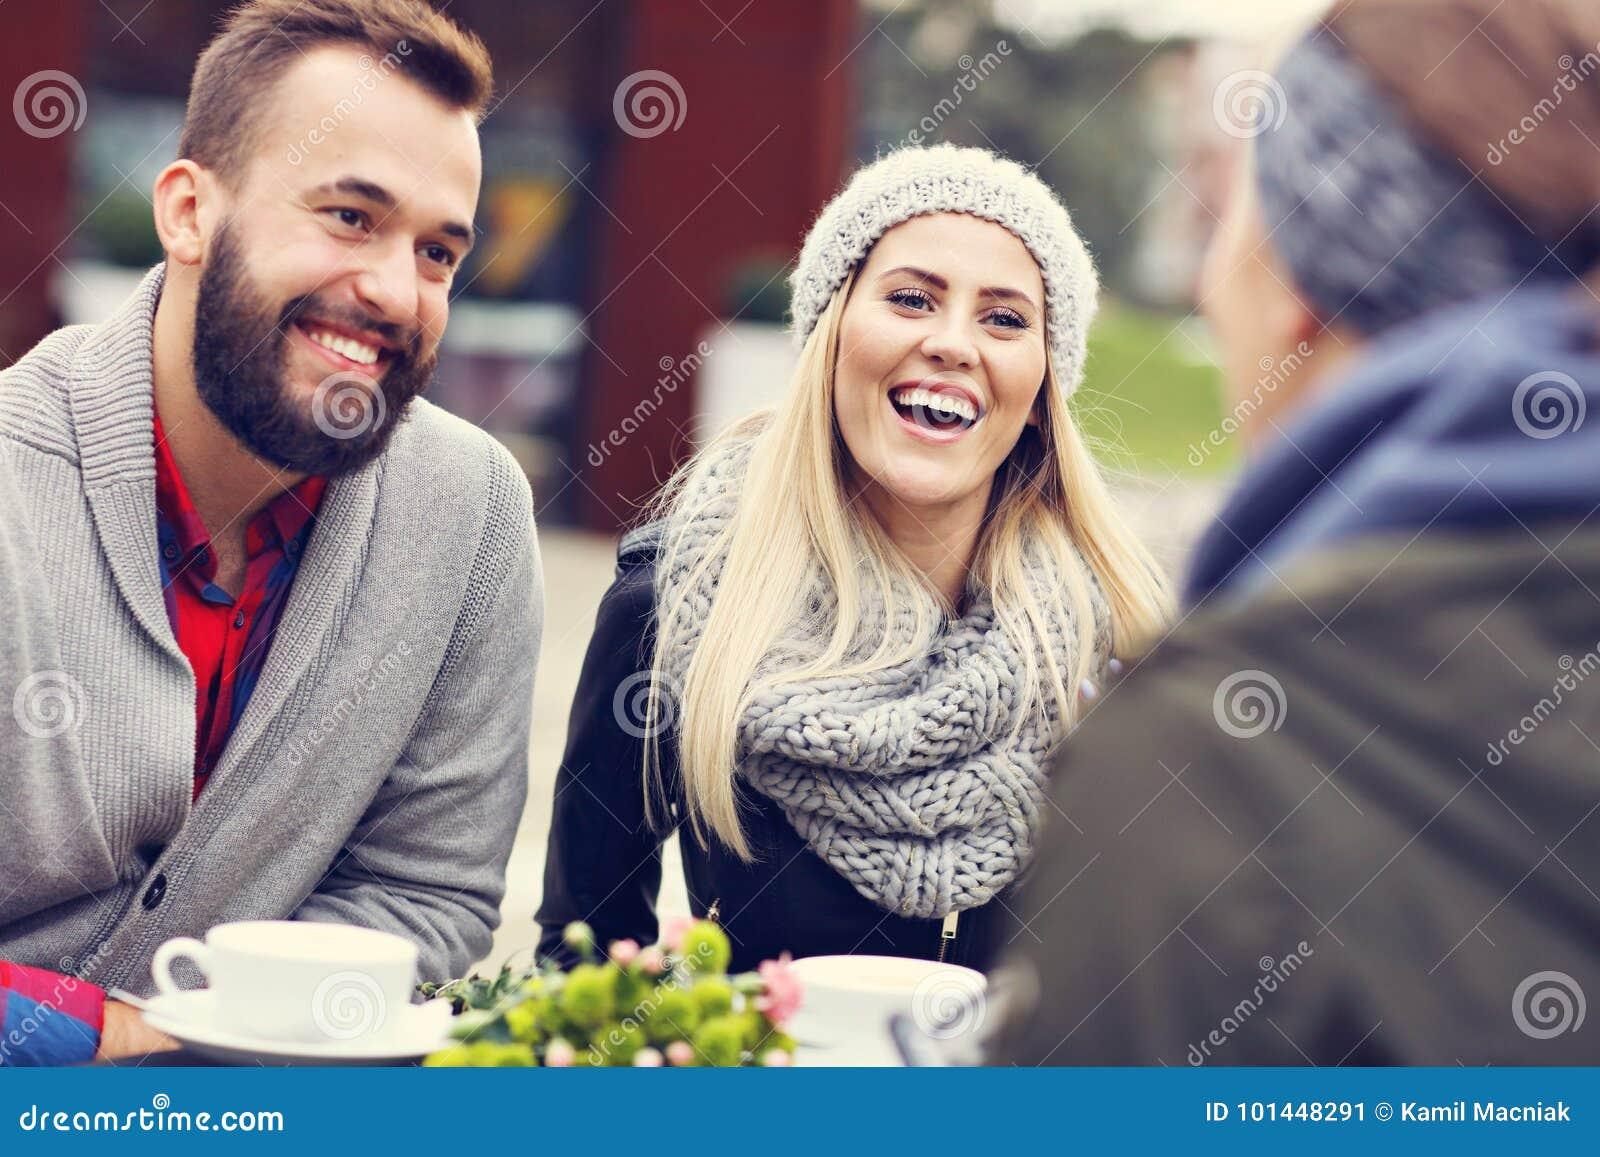 adult dating community